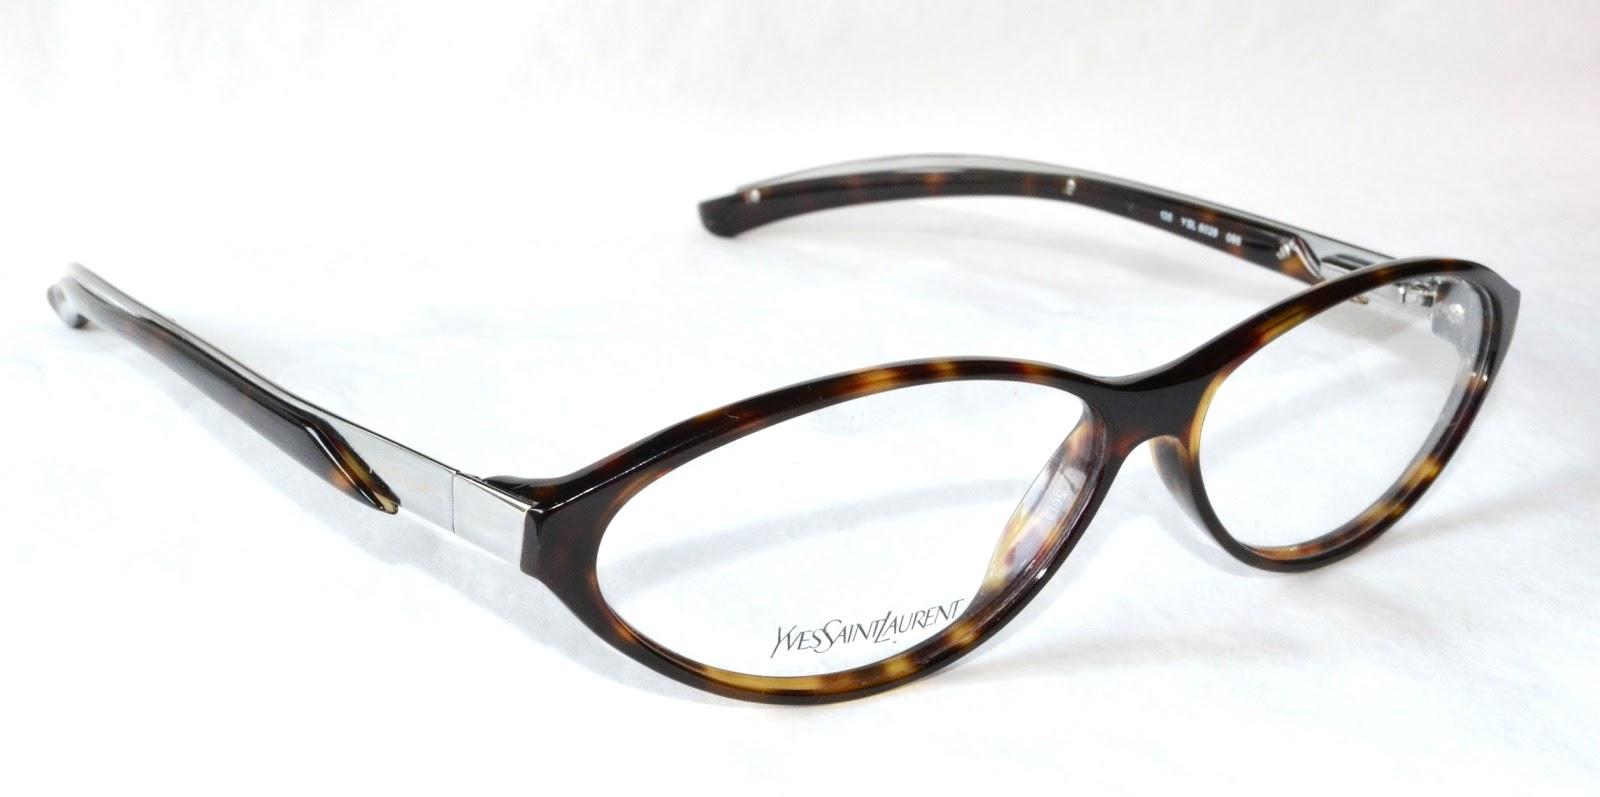 Glasses Frames Designer : Designer Glasses Frames